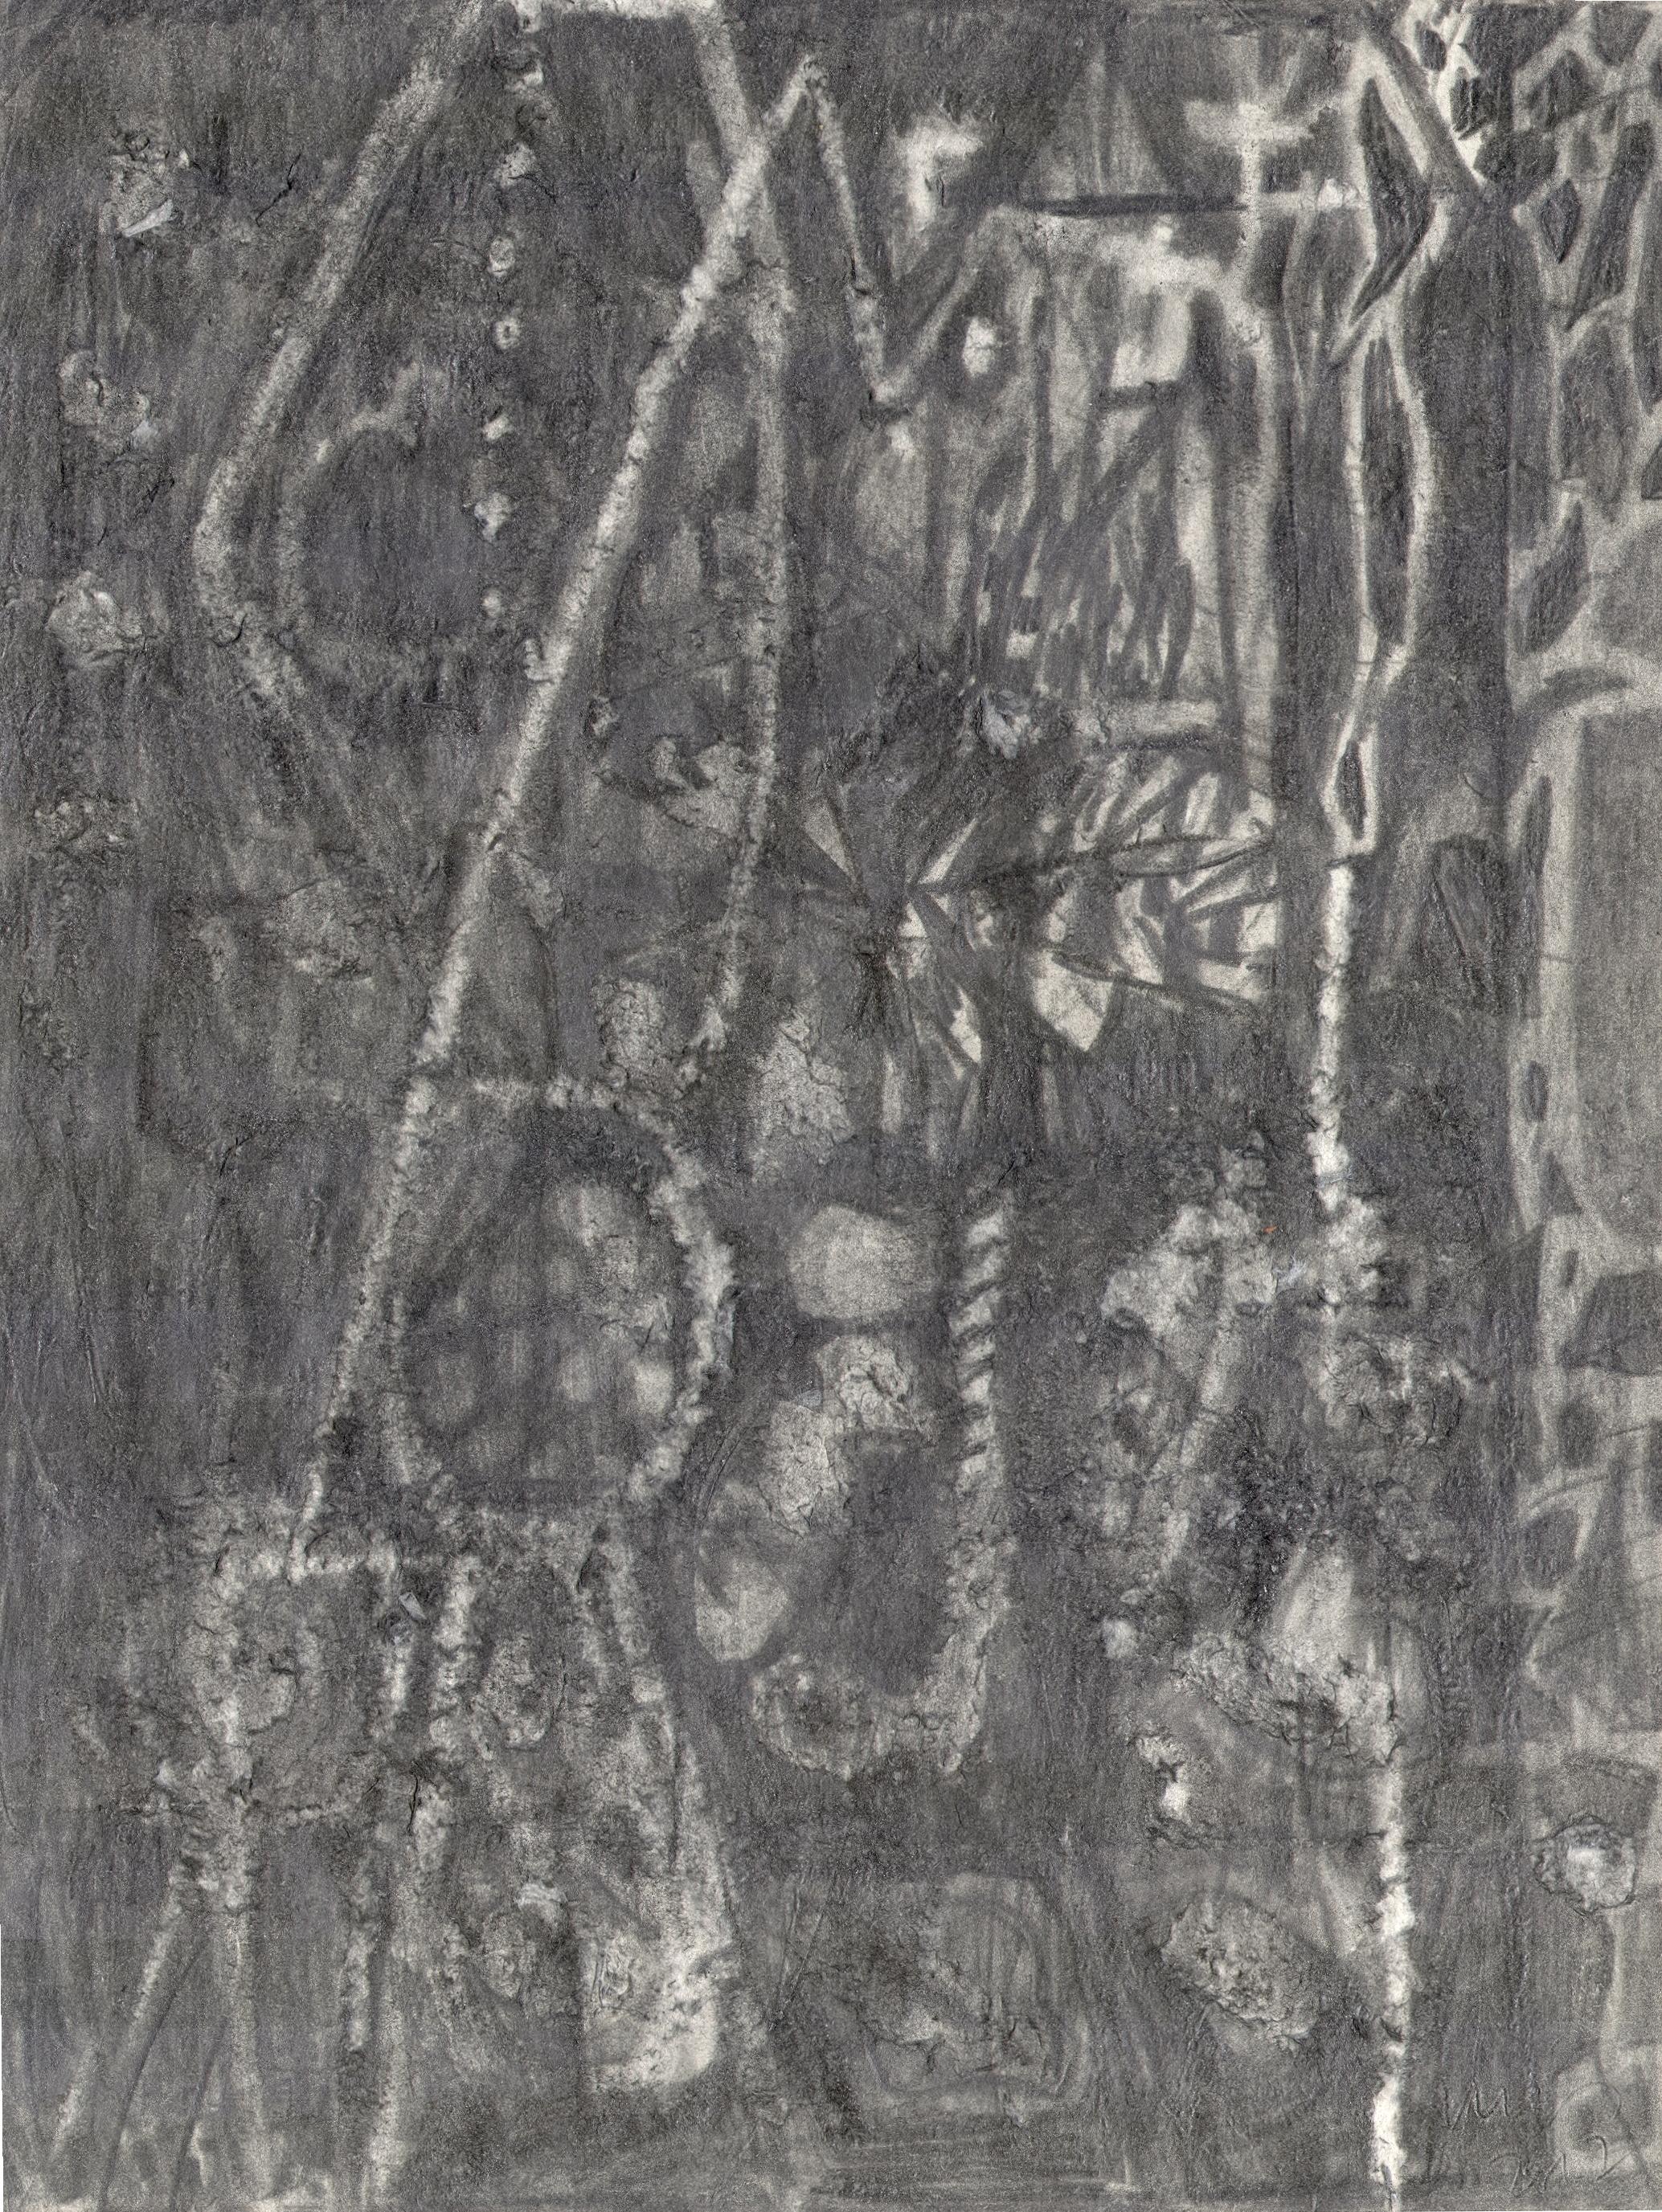 O.T. ( Groteske ), 2016   26x35.5cm, Bleistift auf Papier